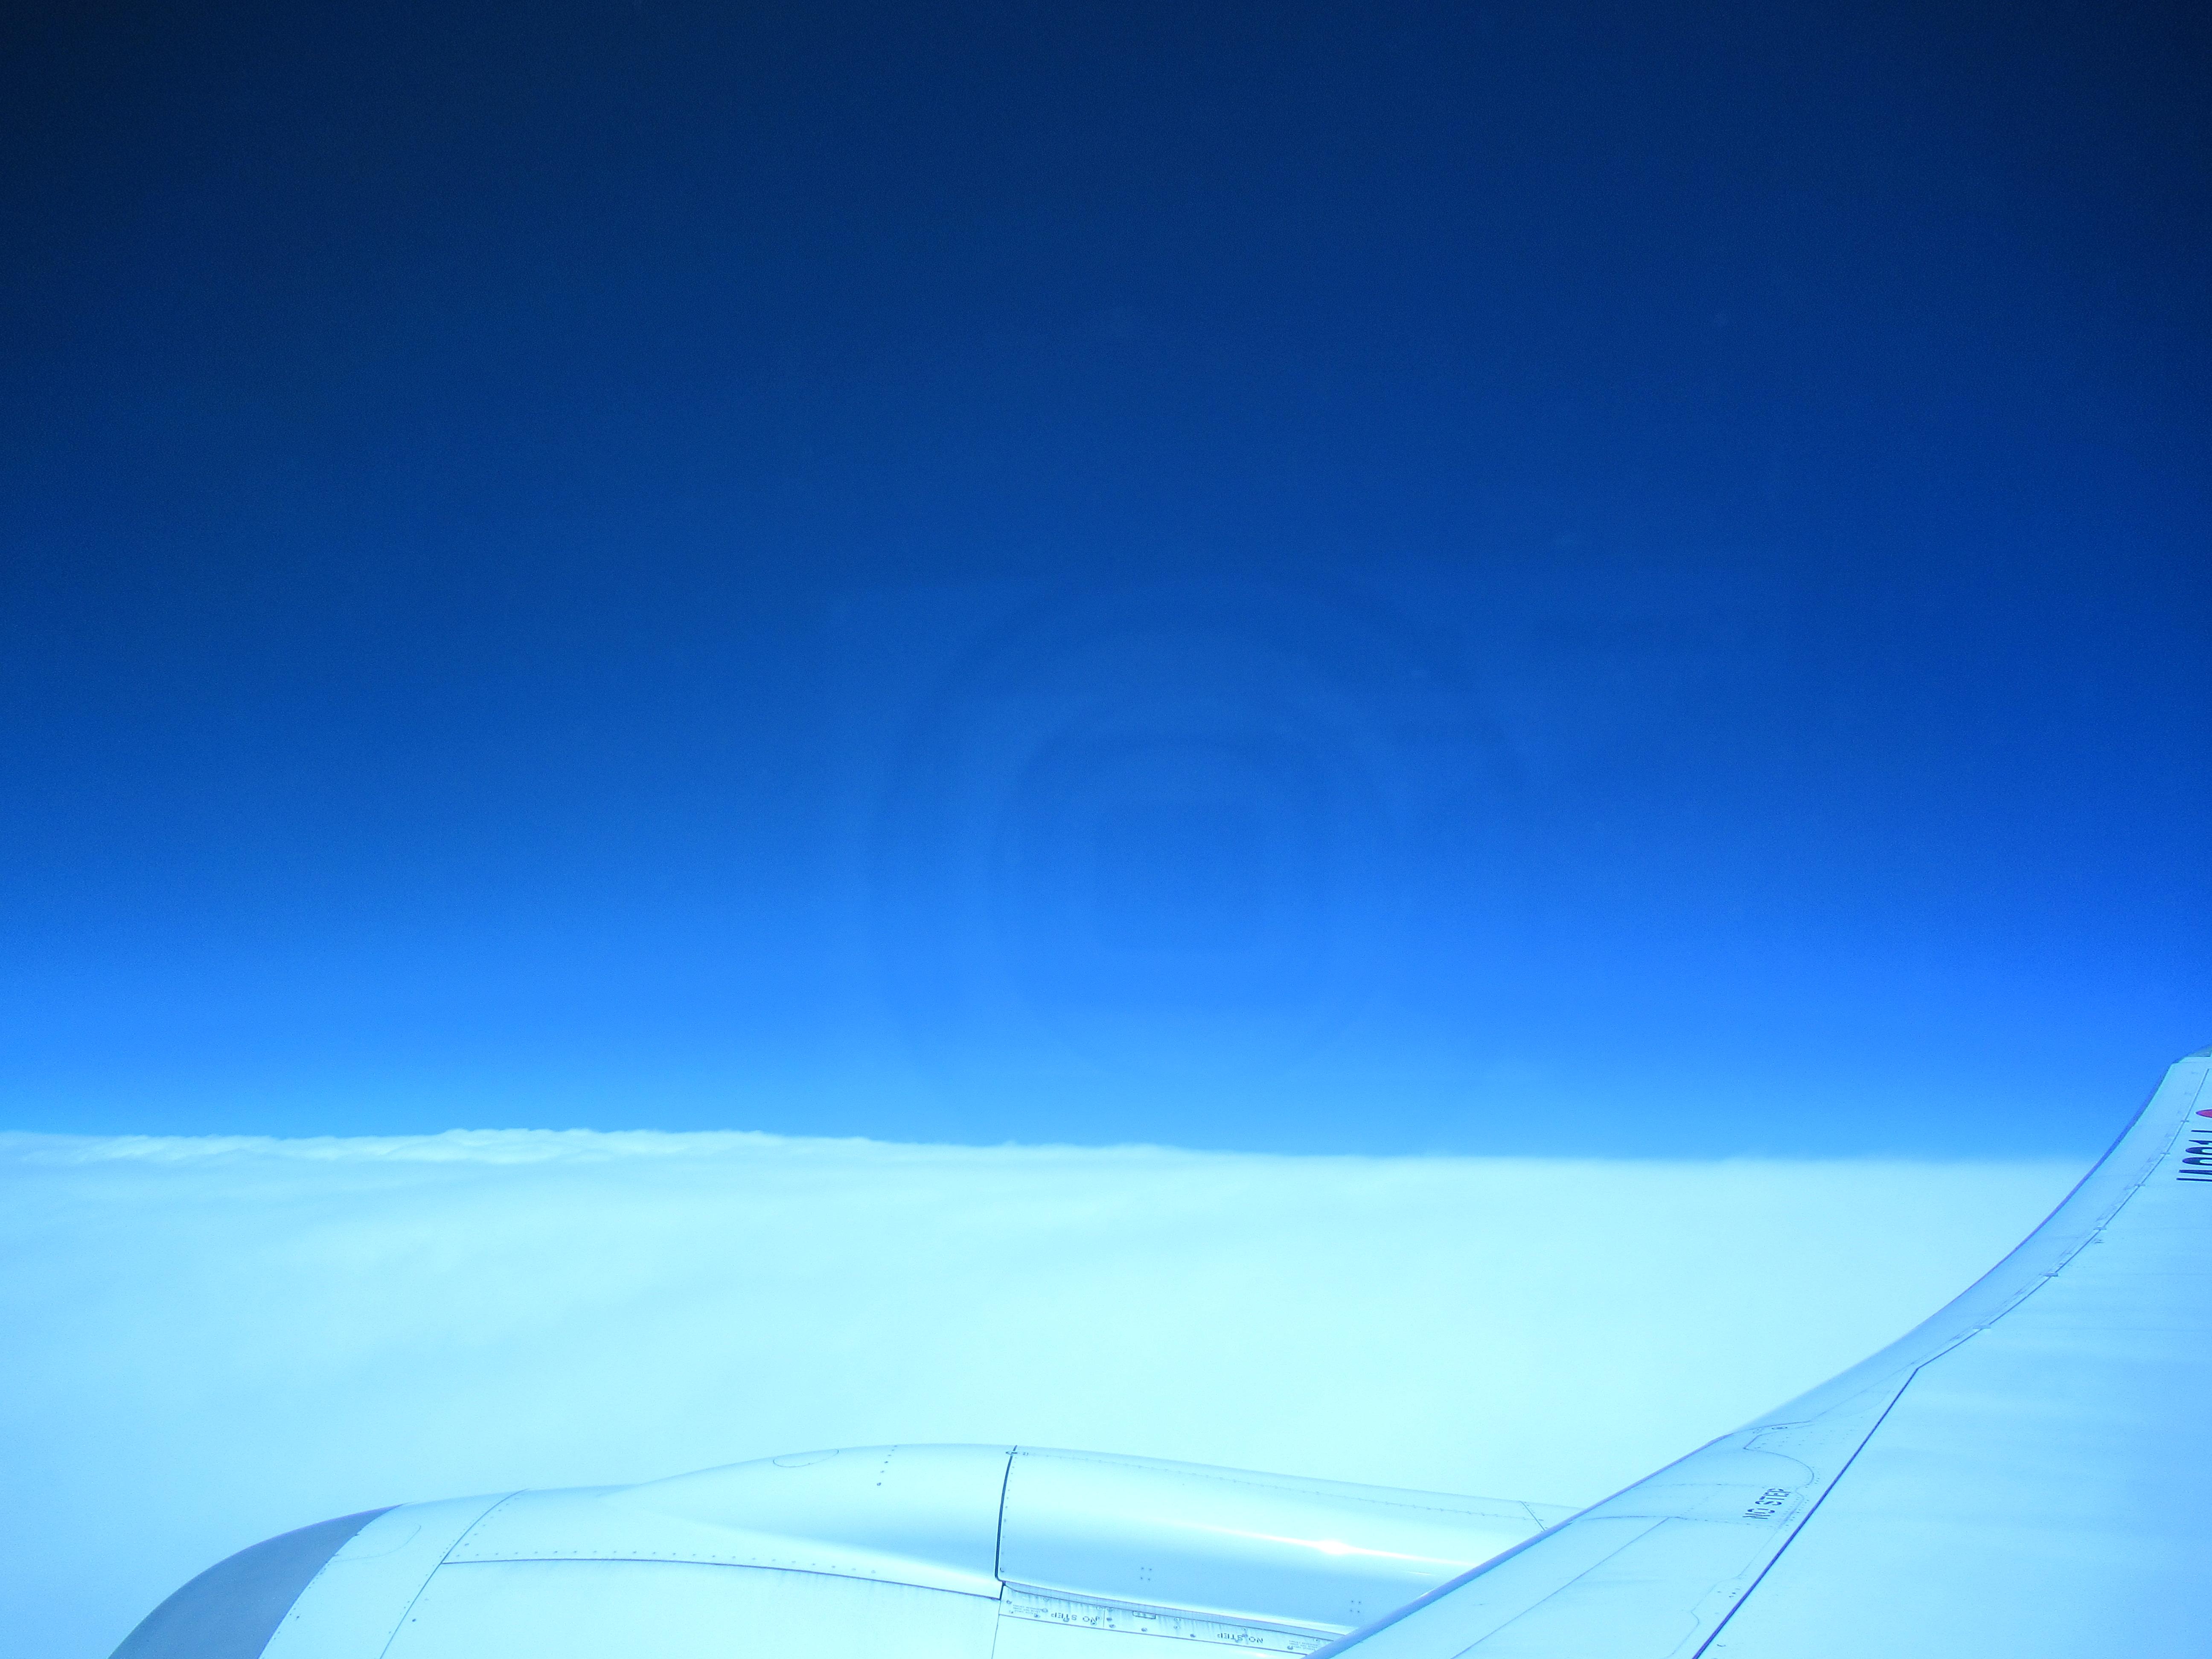 JALのハワイ便|子ども用のチャイルドミールと大人用機内食ルポ